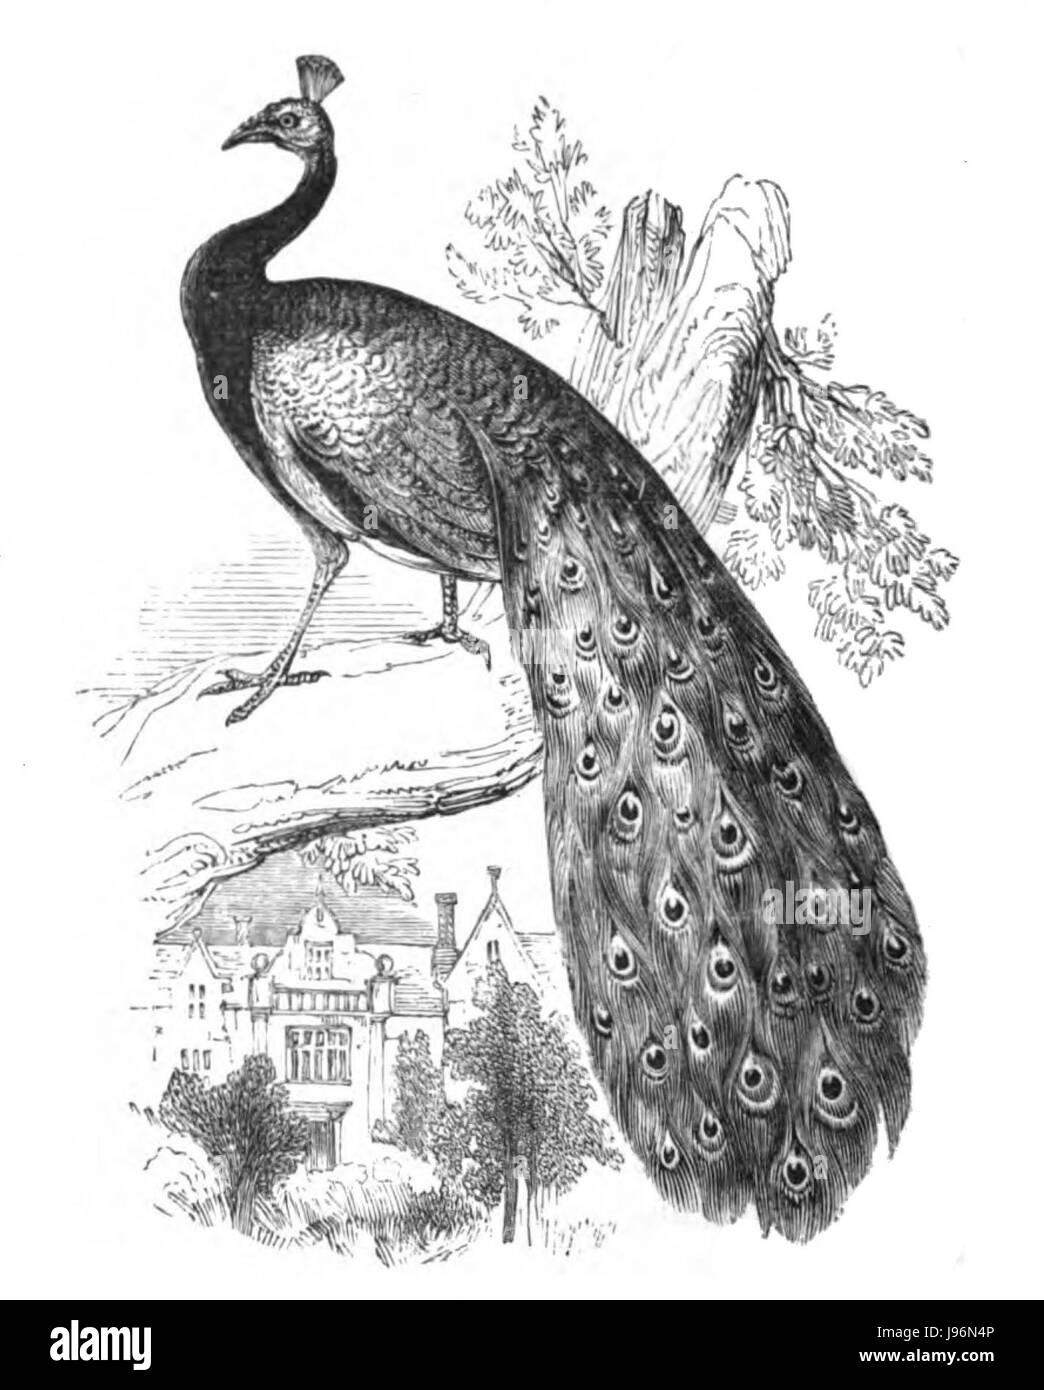 Natural History, Birds   Peacock - Stock Image